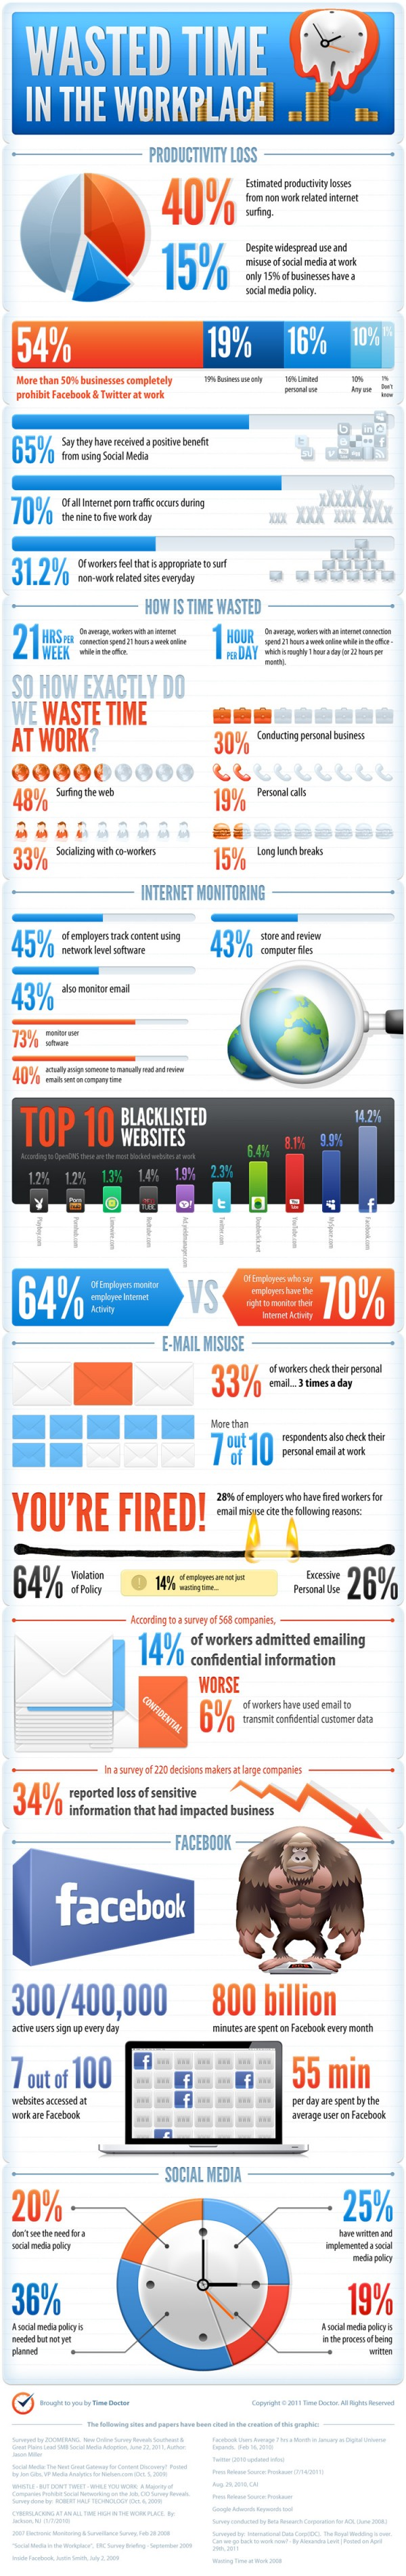 infographic-on-social-media-09